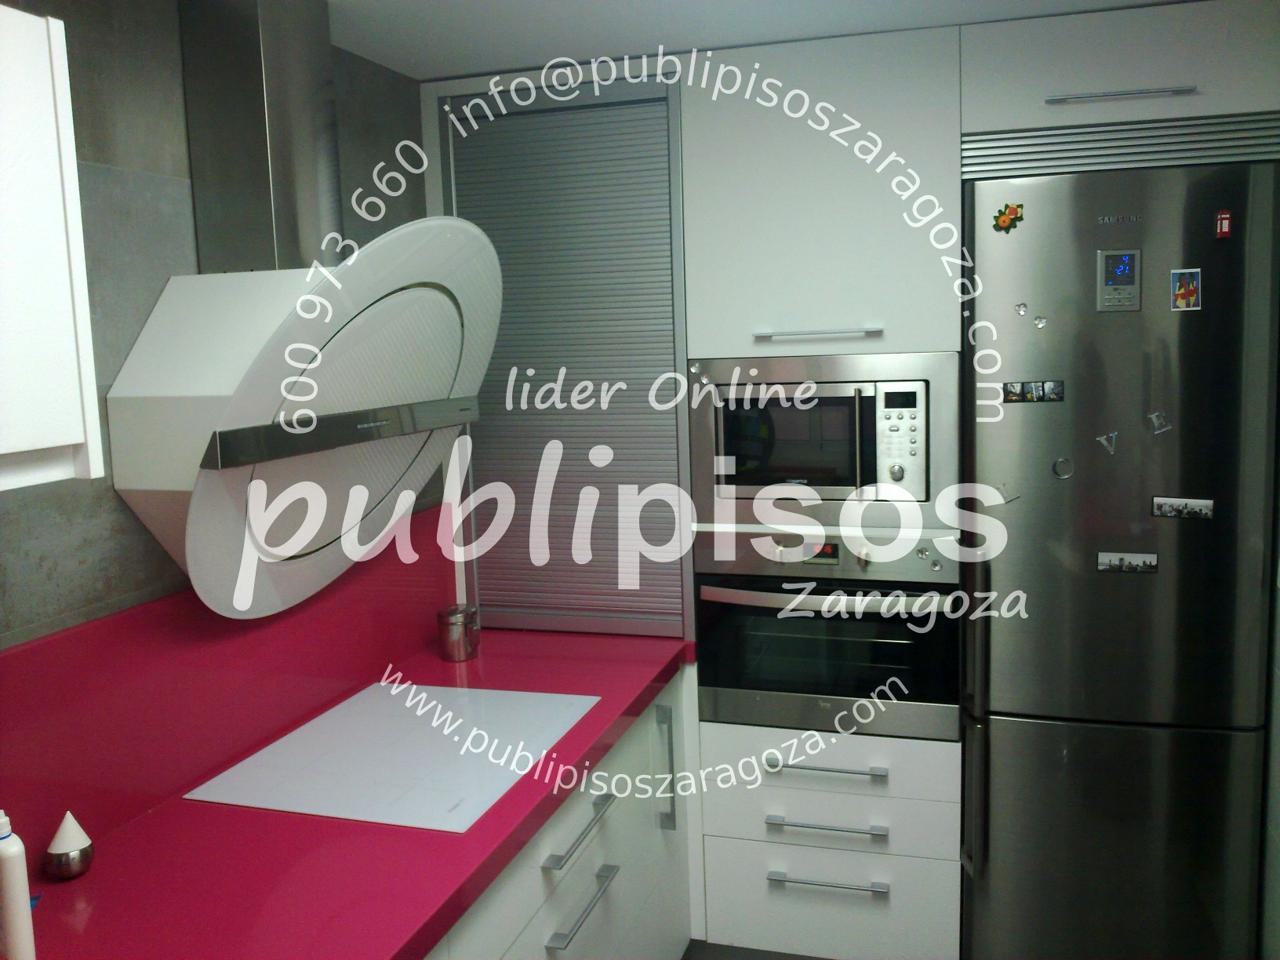 Venta Atico Duplex Obra Nueva Centro Casco Histórico Zaragoza|PUBLIPISOS Inmobiliarias-22